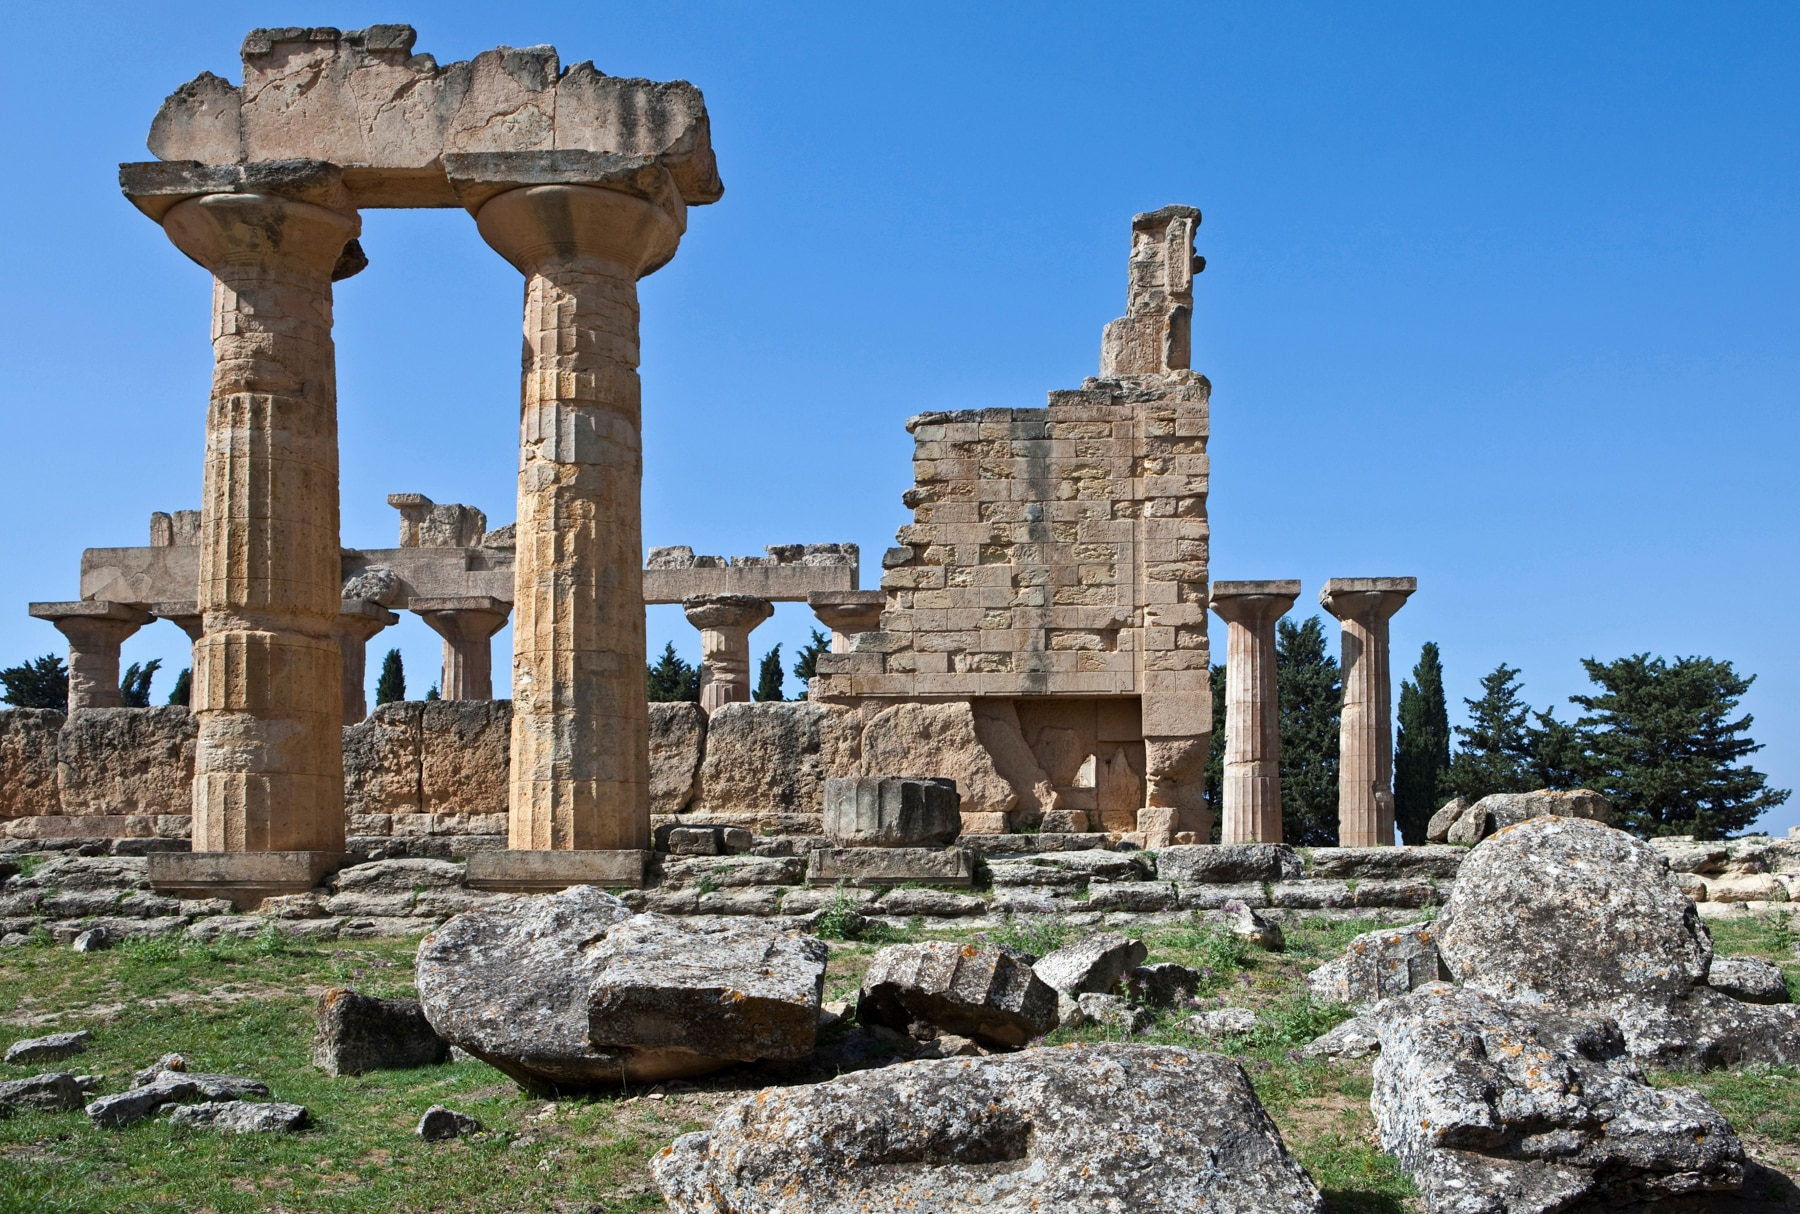 Археологический памятник (© Giuseppe Masci/AGF/UIG/Getty Images)